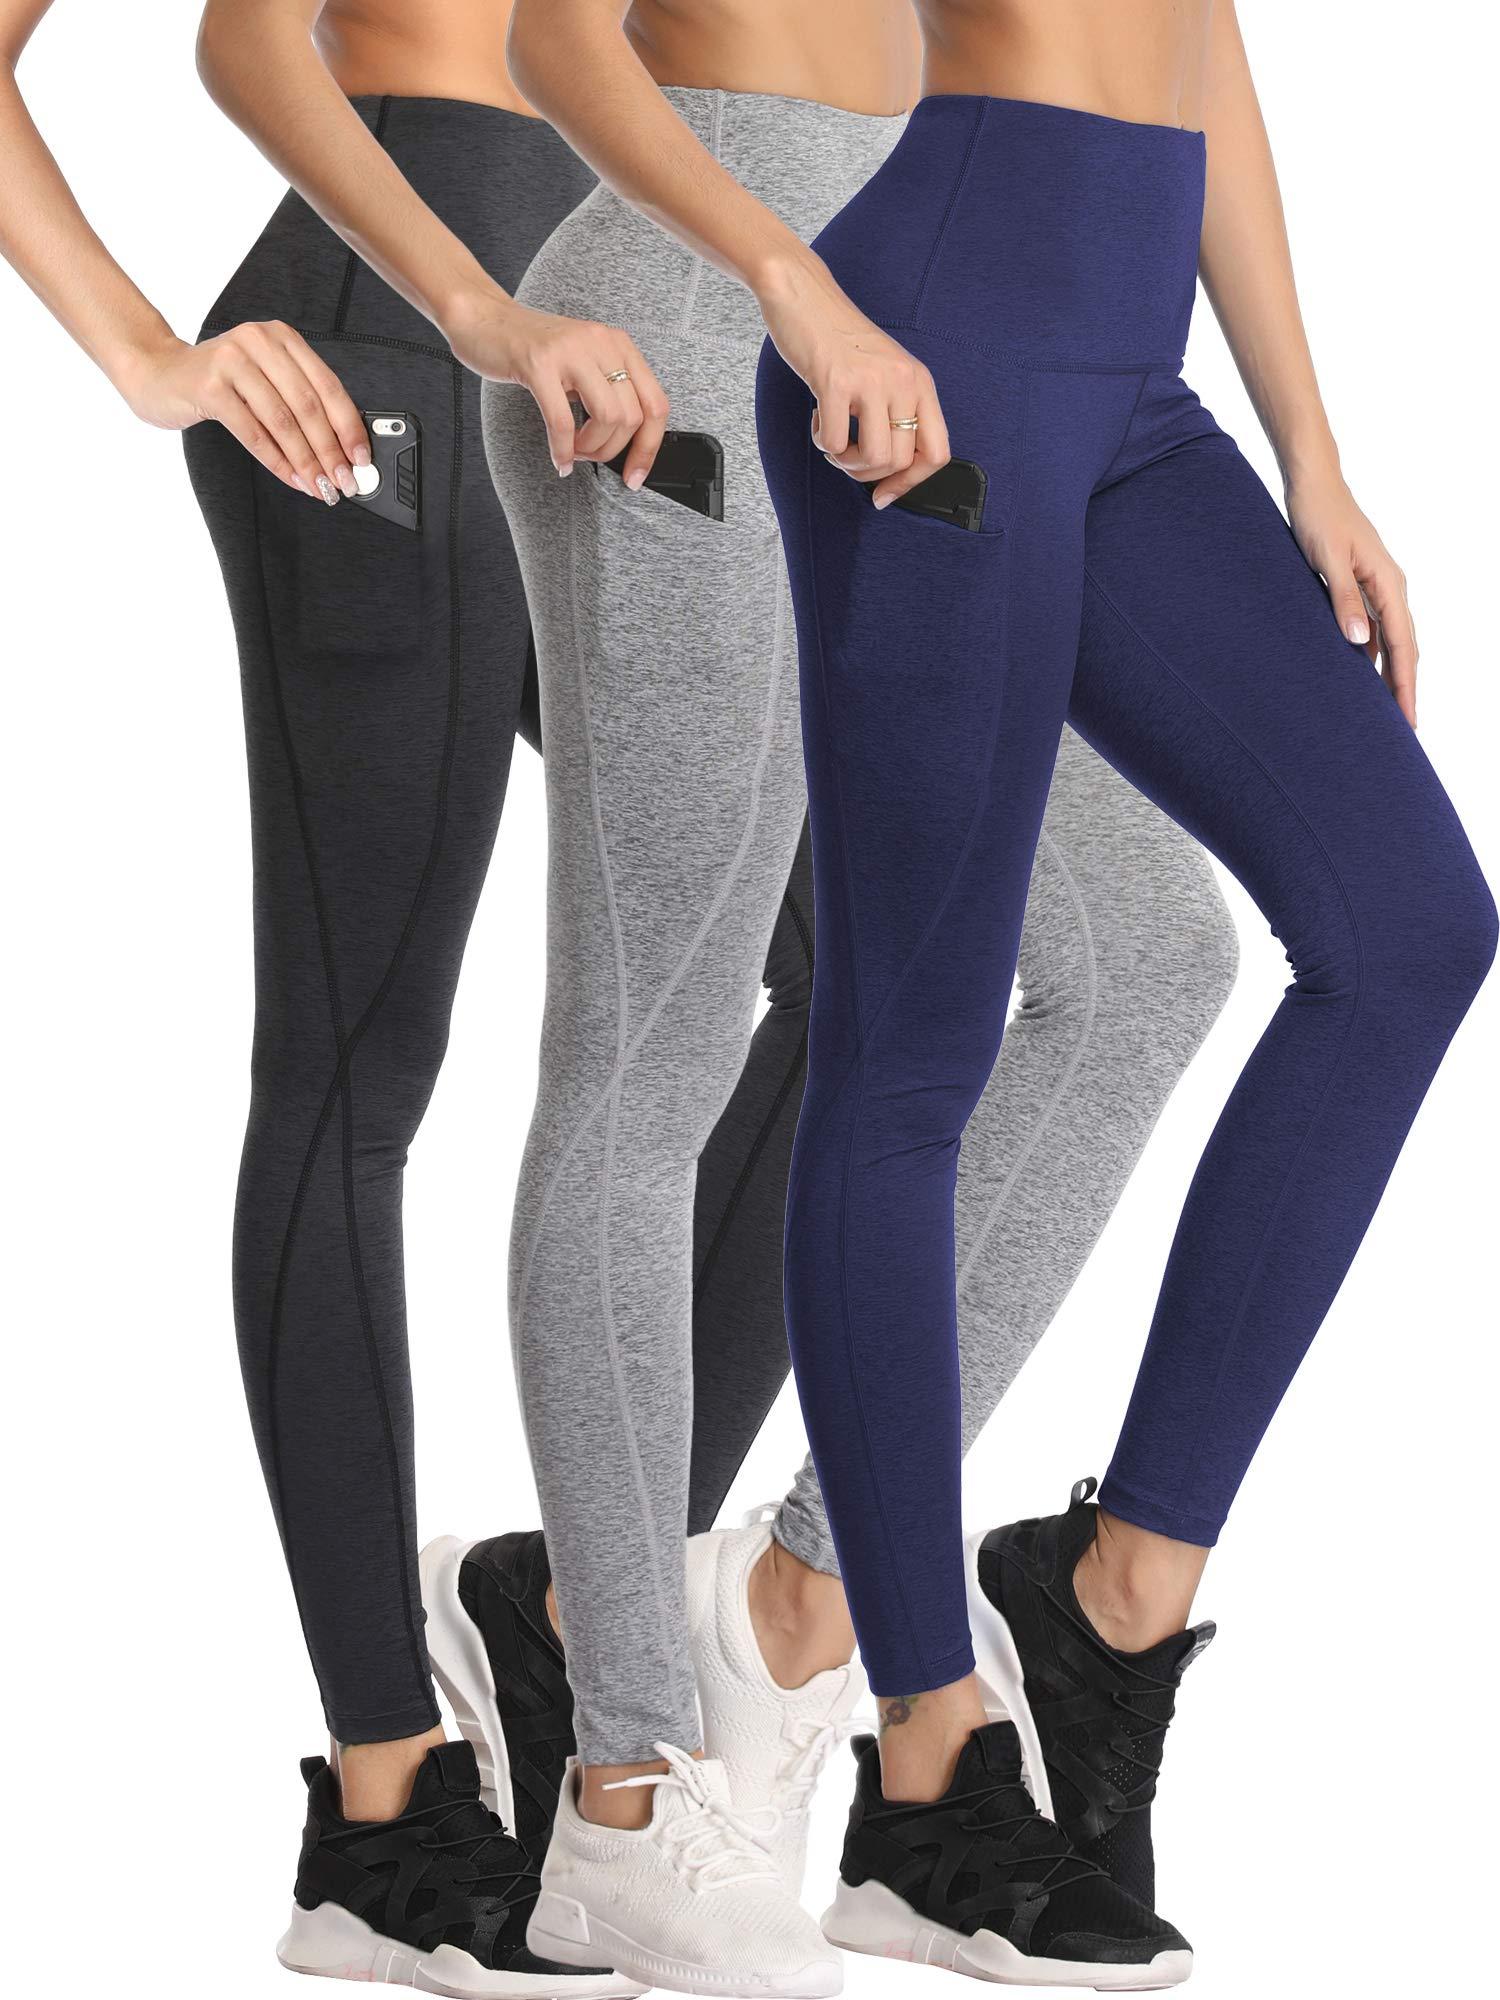 Neleus Women's 3 Pack Yoga Pants Tummy Control High Waist Workout Leggings,Dark Grey/Grey/Navy Blue,S by Neleus